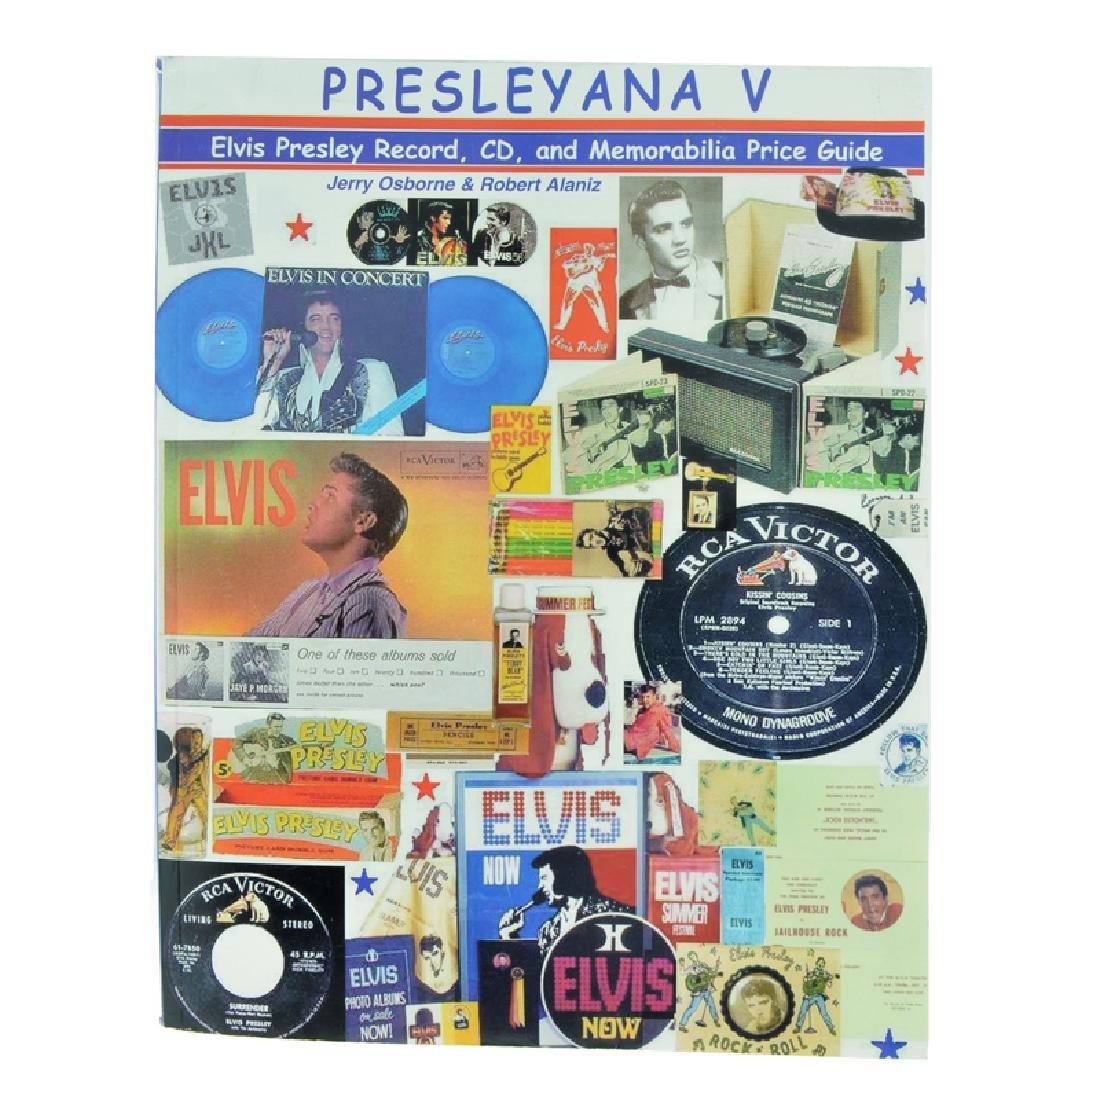 Presleyana V: The Elvis Presley Album, CD, And